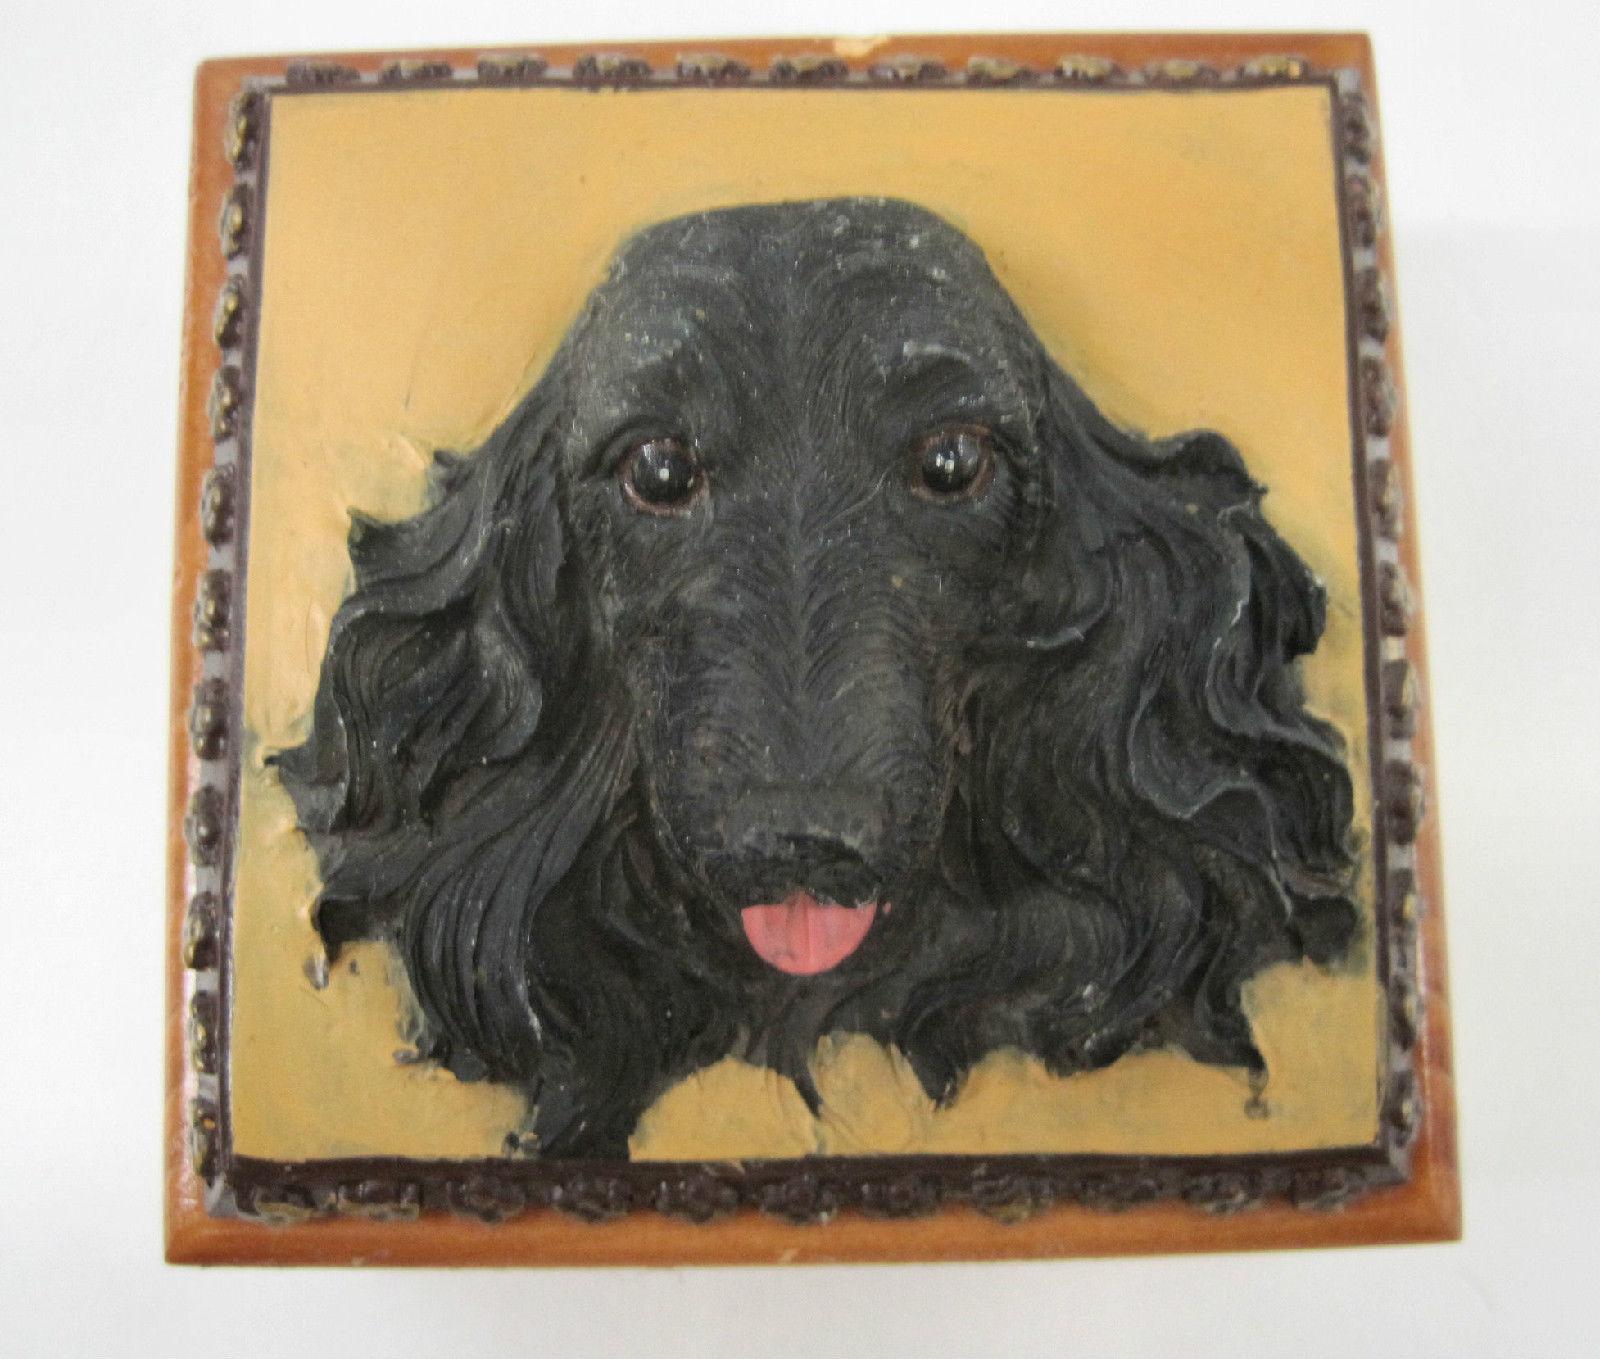 English Cocker Spaniel Black Dog Puppy Wooden Trinket Box Vintage 3 ins